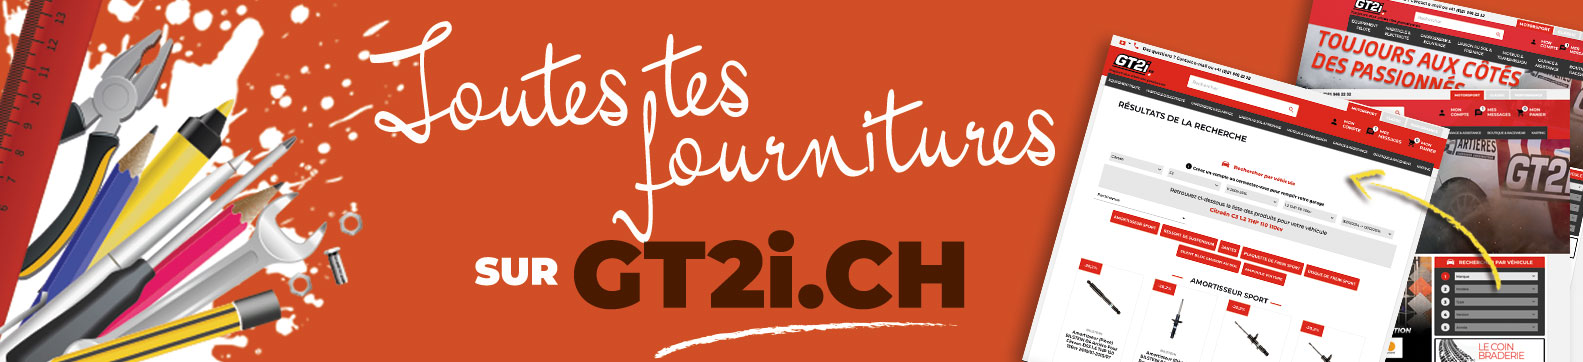 GT2i.ch